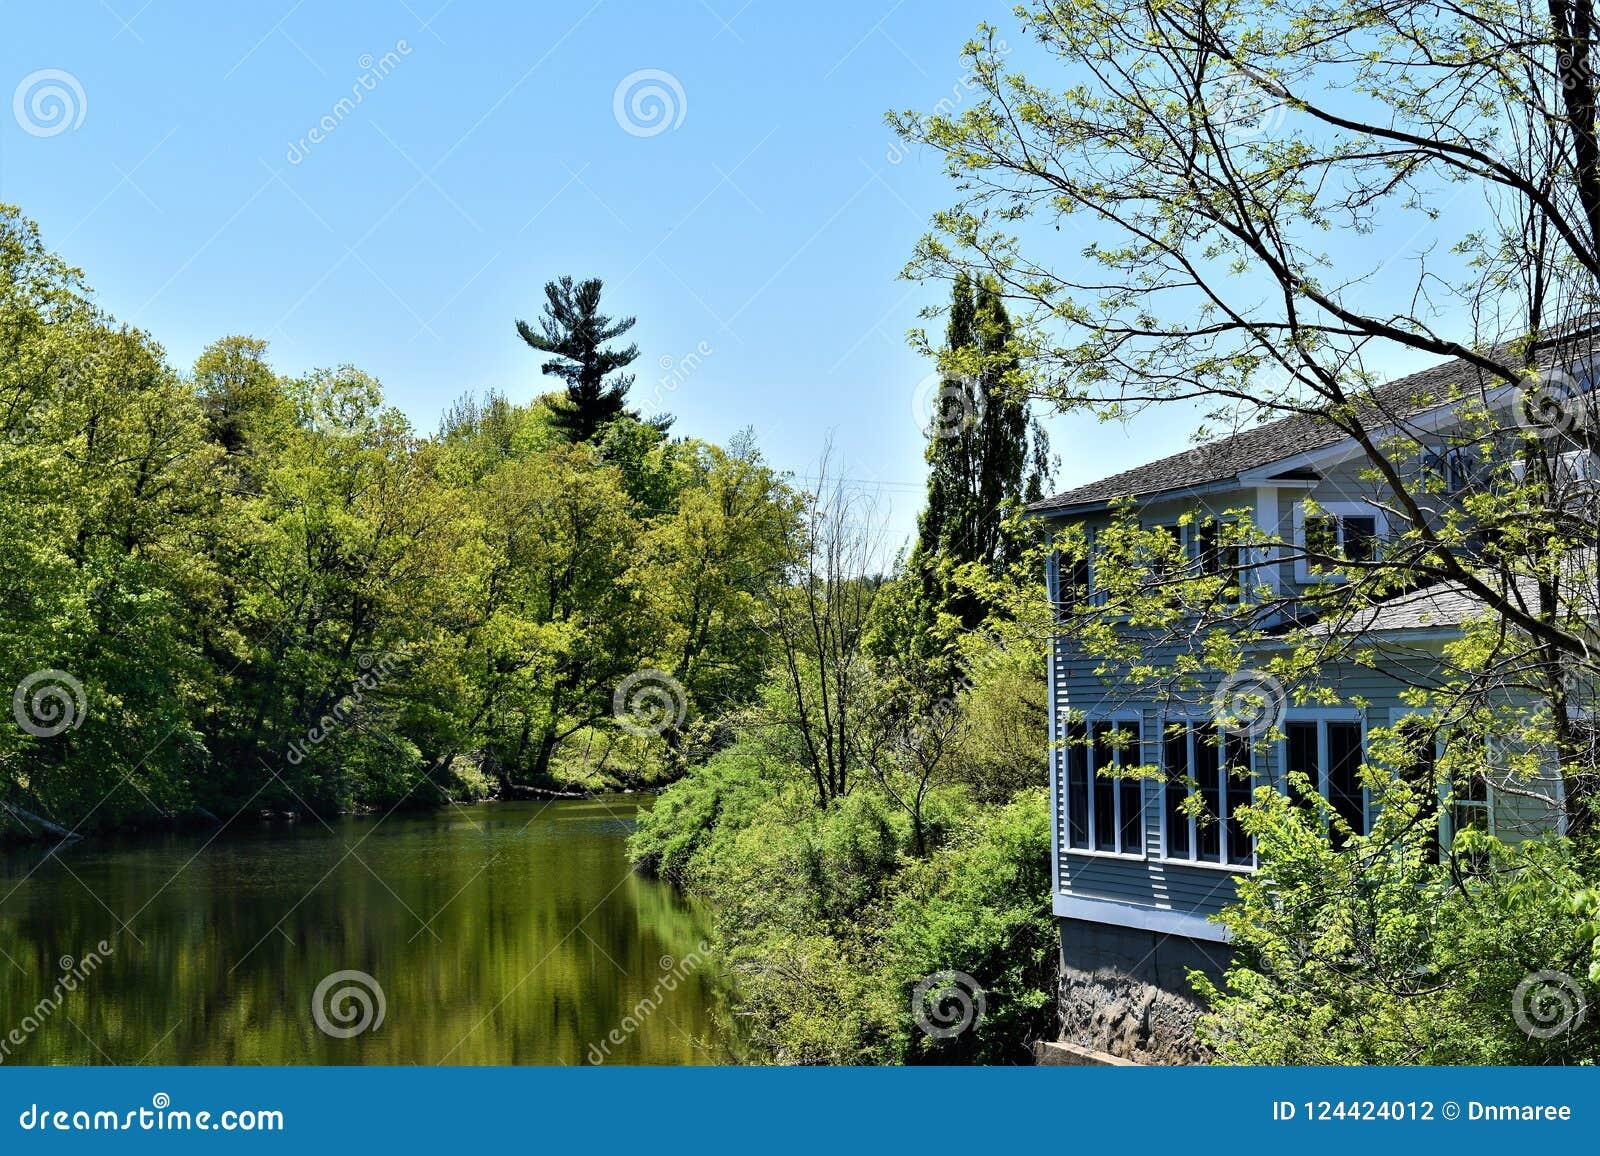 Fiume di Contoocook, città di Peterborough, la contea di Hillsborough, New Hampshire, Stati Uniti